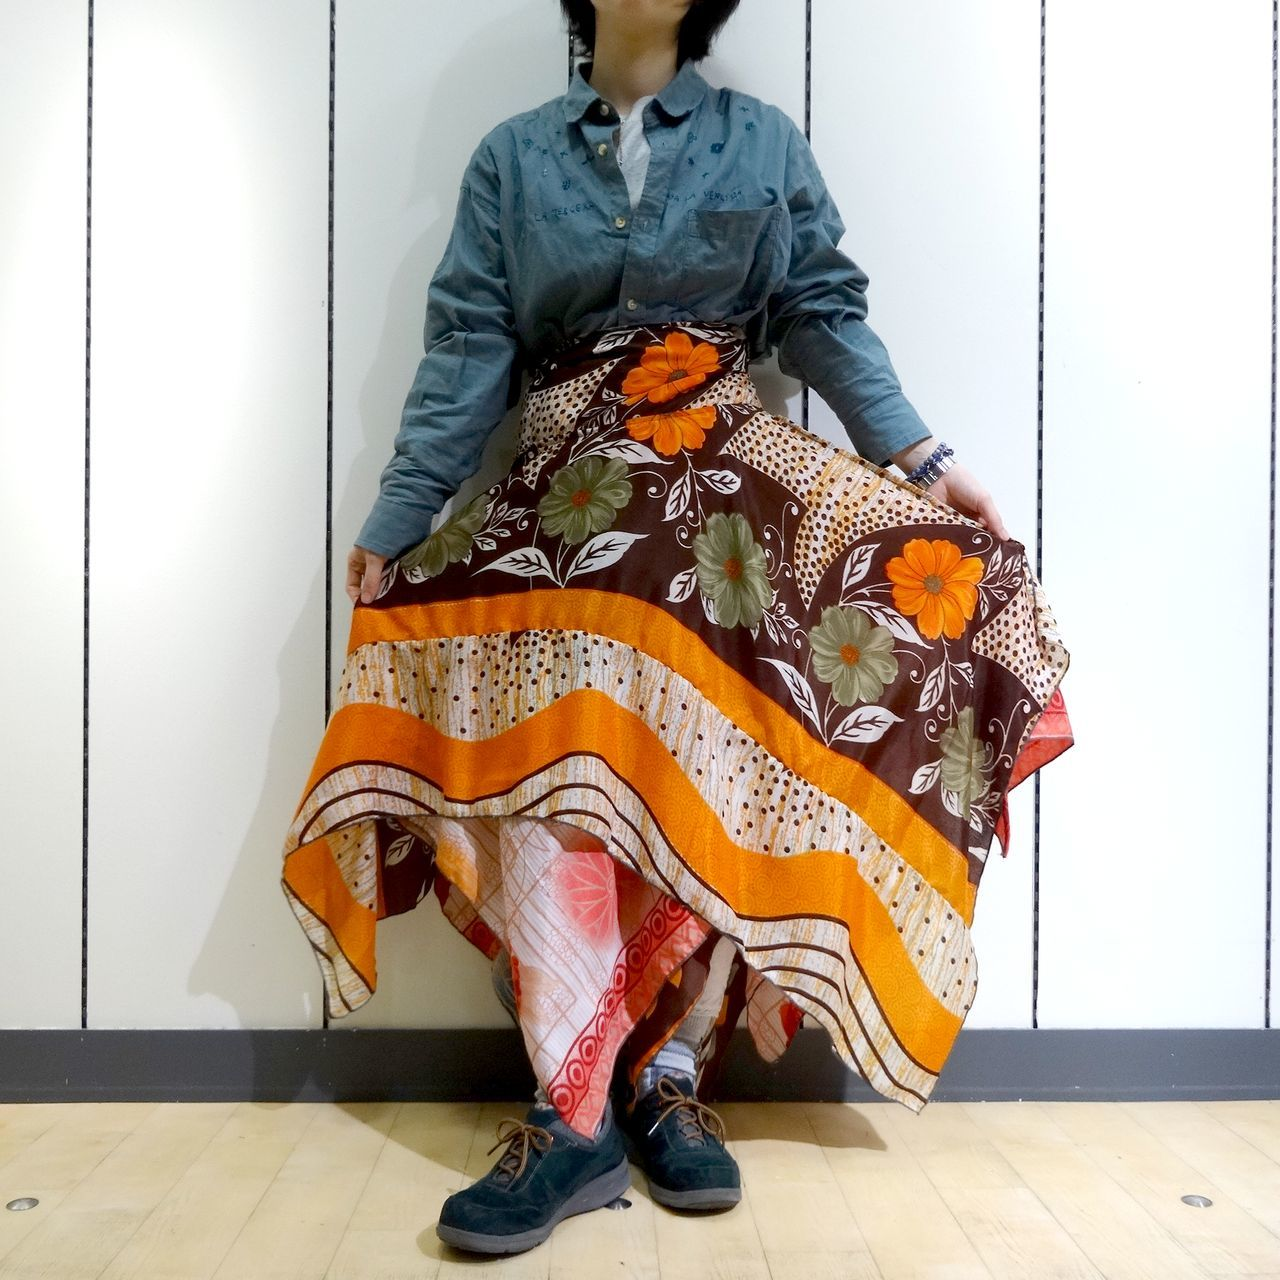 vdsz-005  ビンテージシルクサリーギザスカート「レトロモダン」